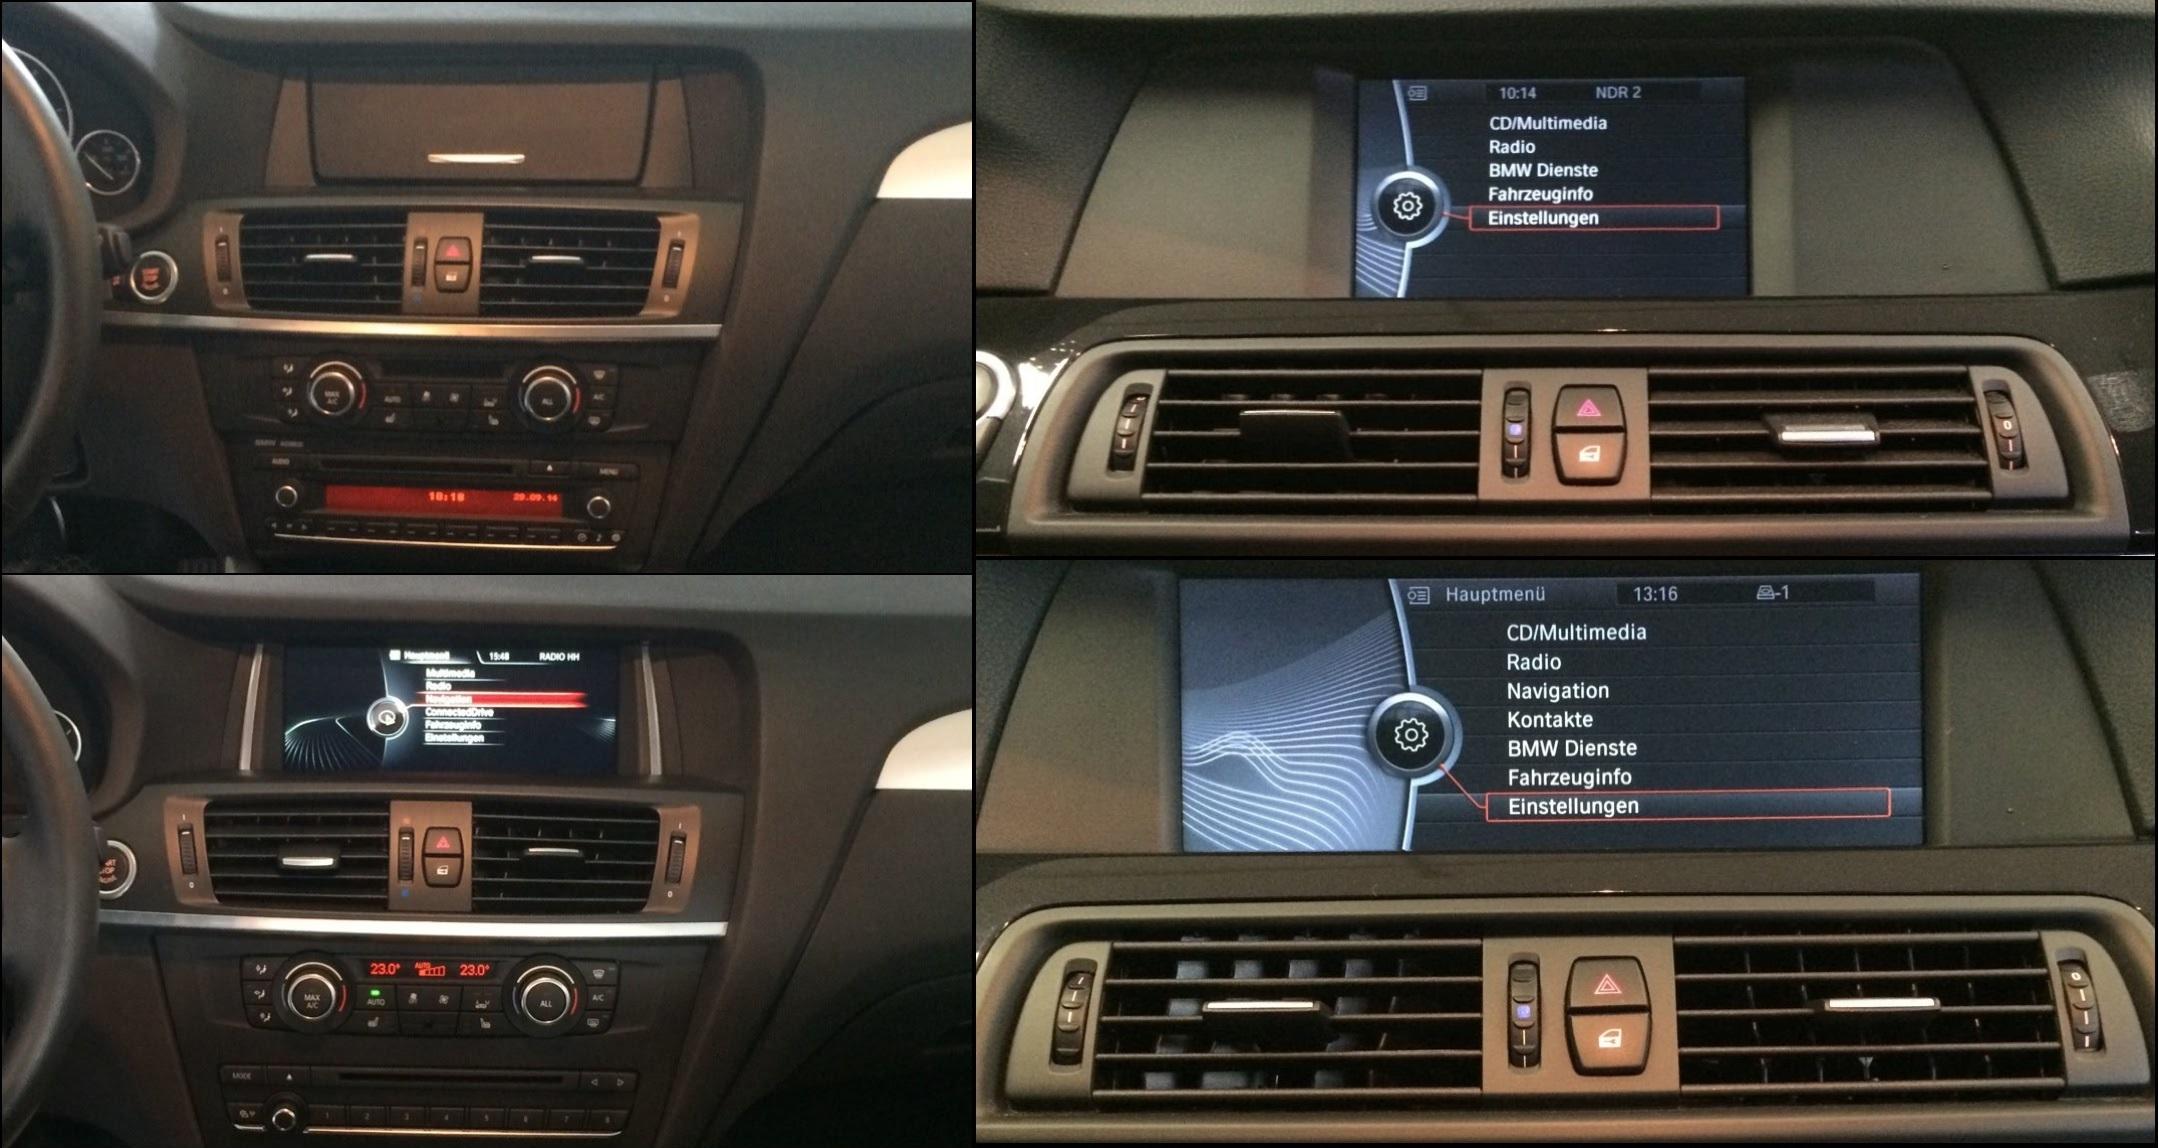 BMW navigace